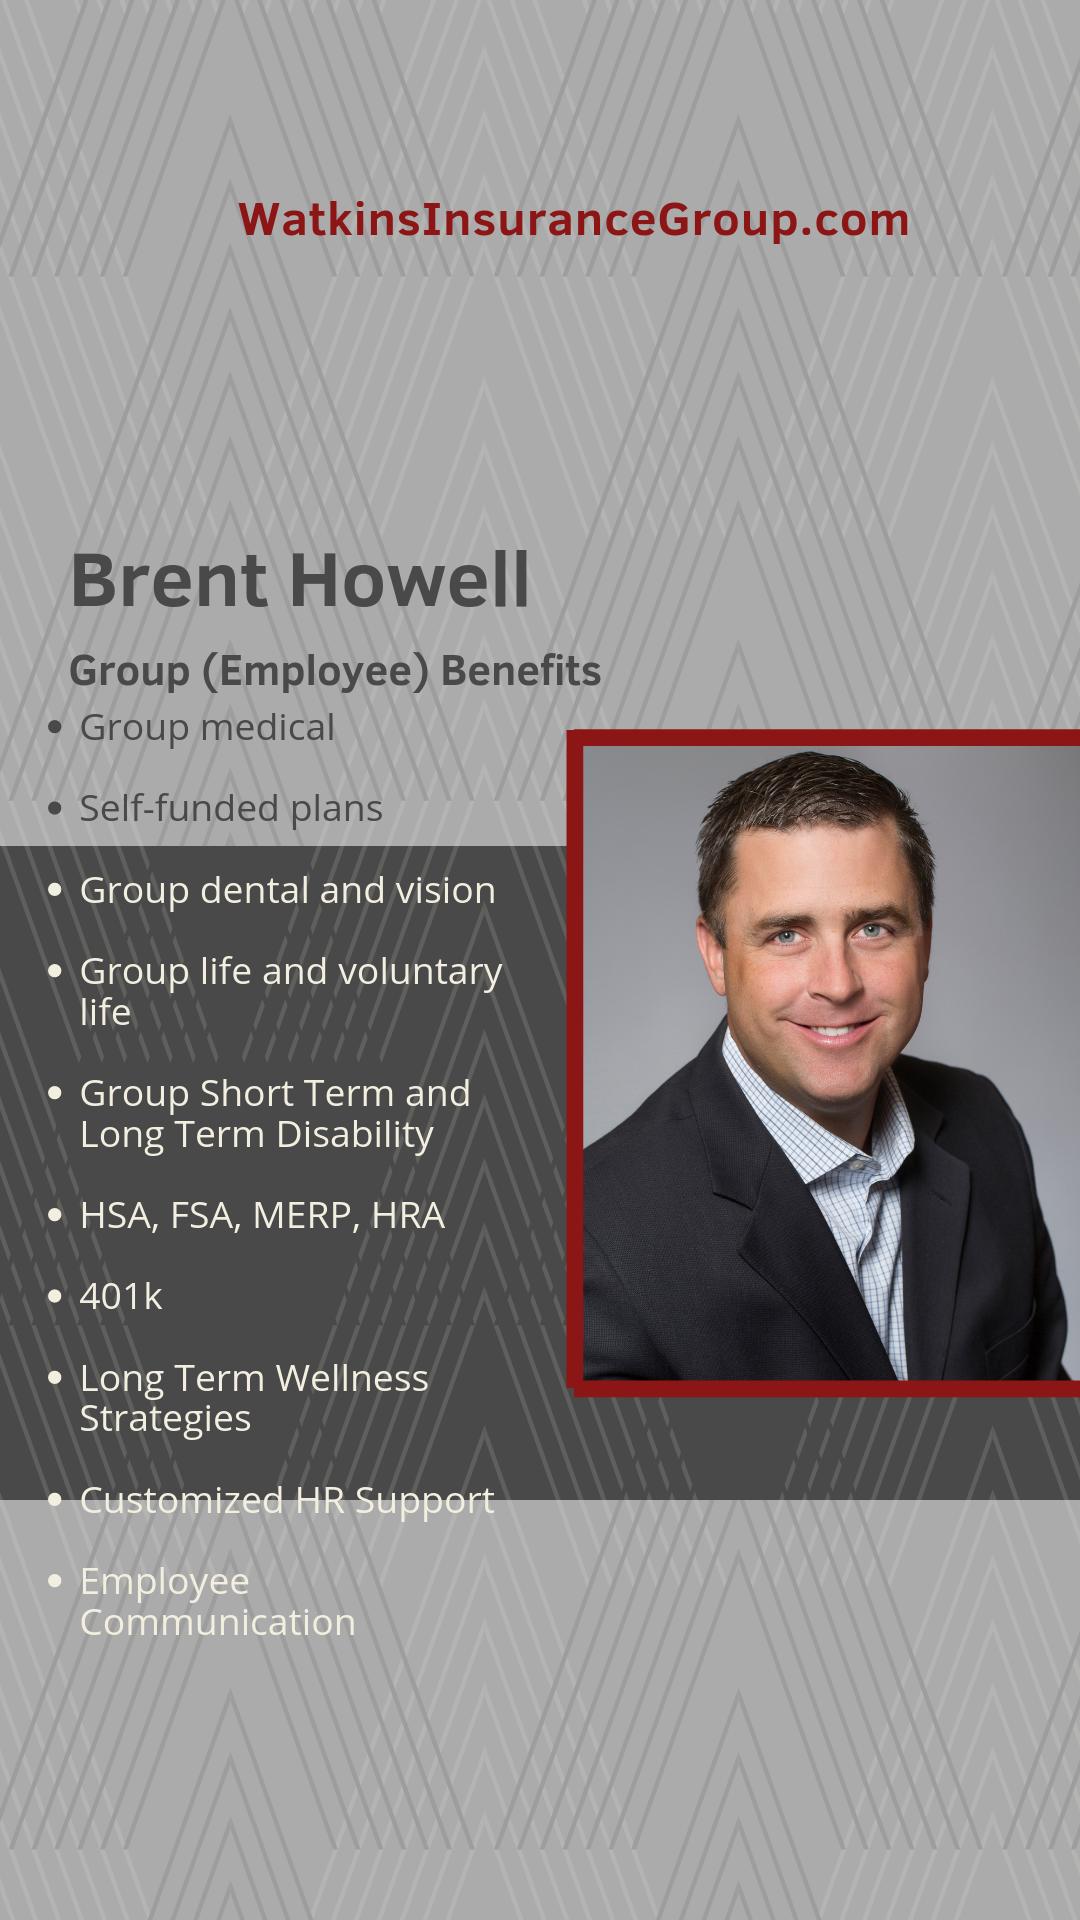 Group Benefits Insurance Employee, Group insurance